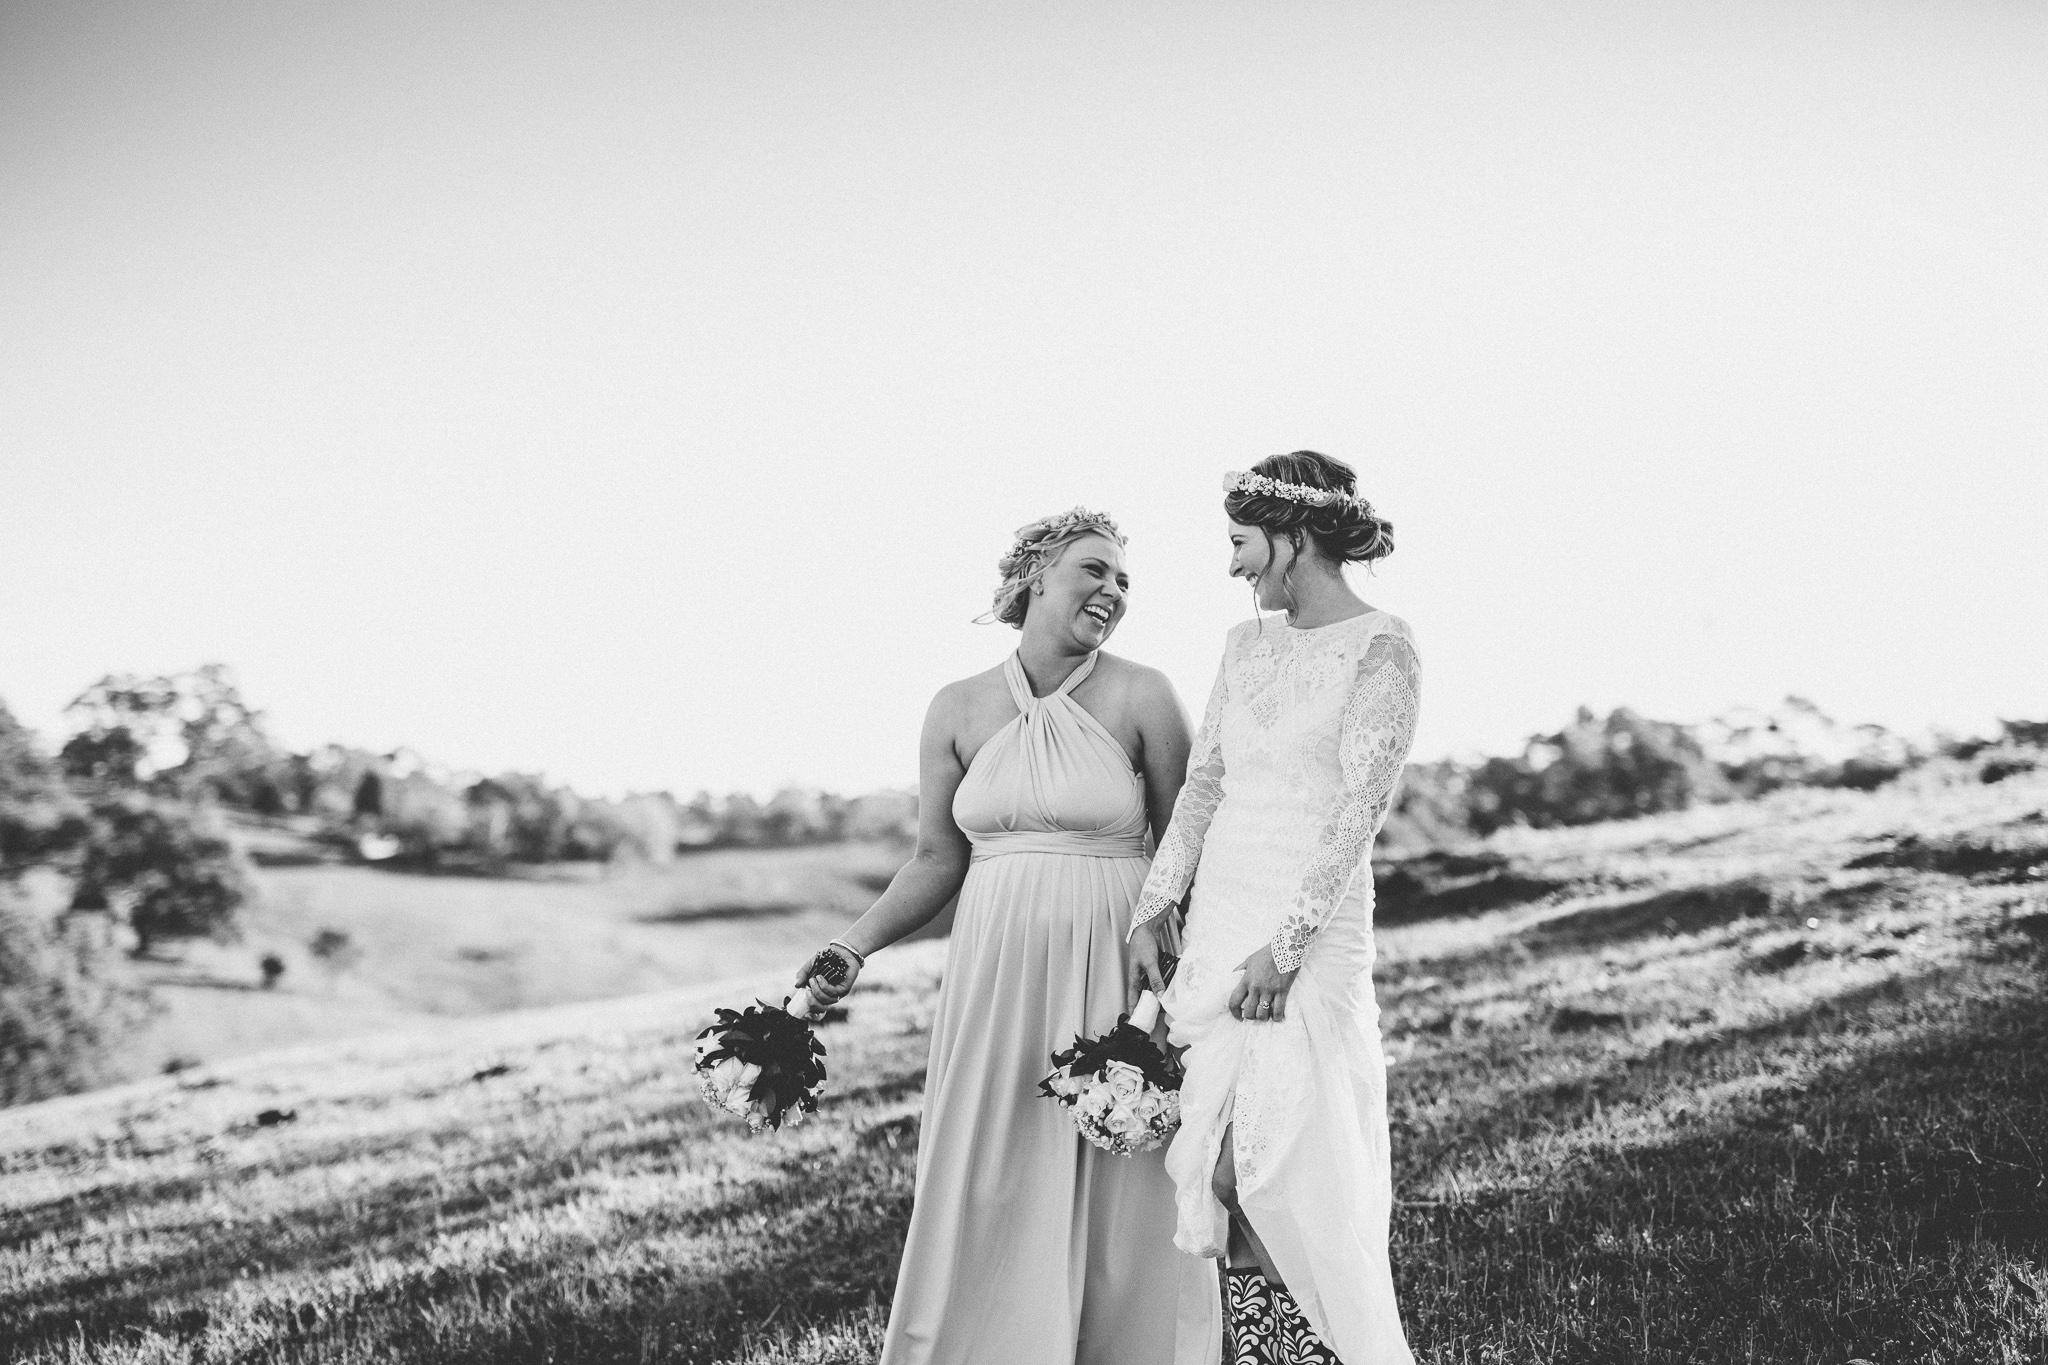 christopher morrison_adelaide hills wedding_ andy + teegan_60_0793.jpg